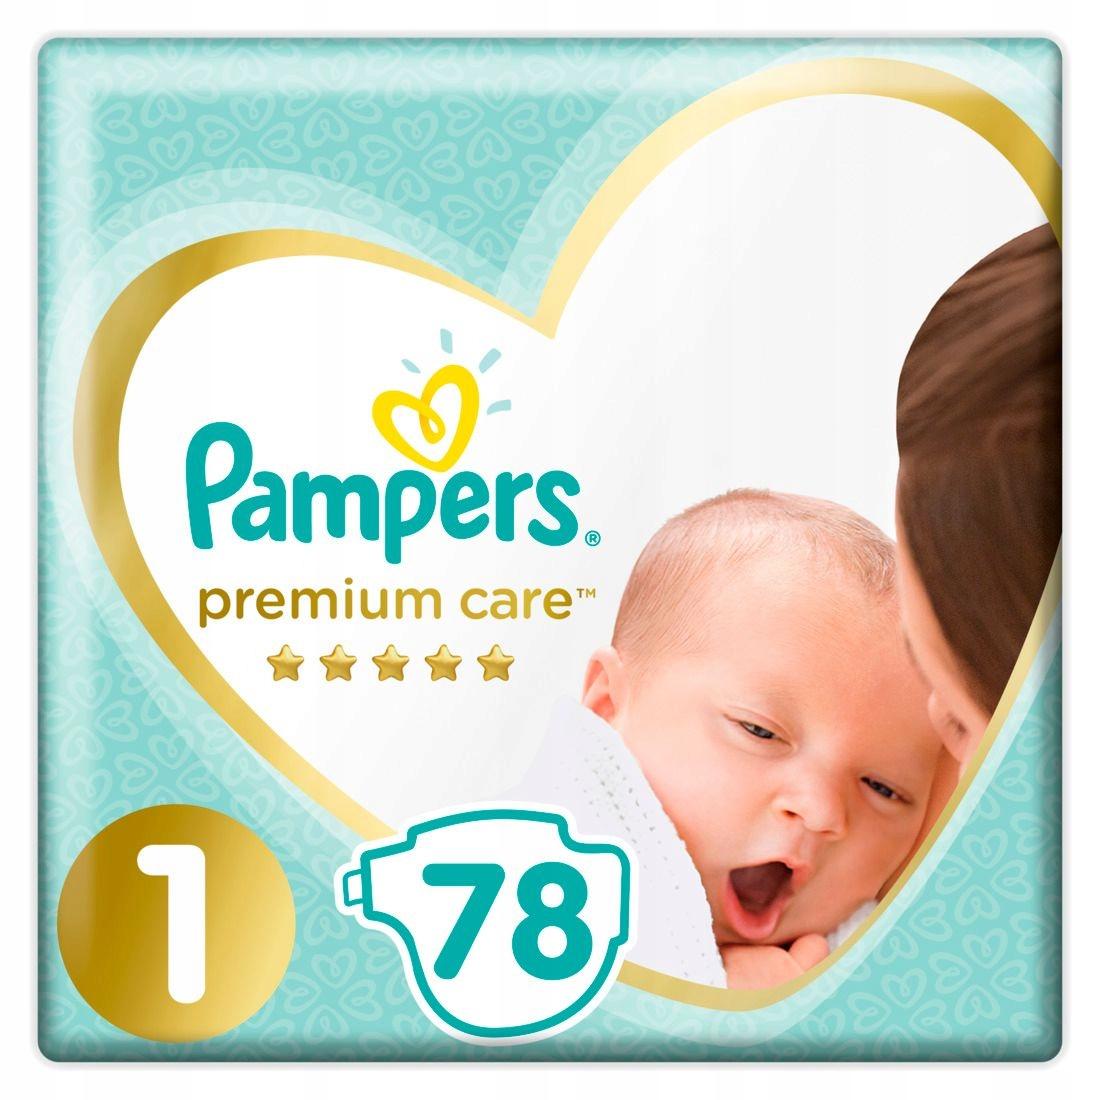 Pampers premium care, размер 1, 78 подгузники